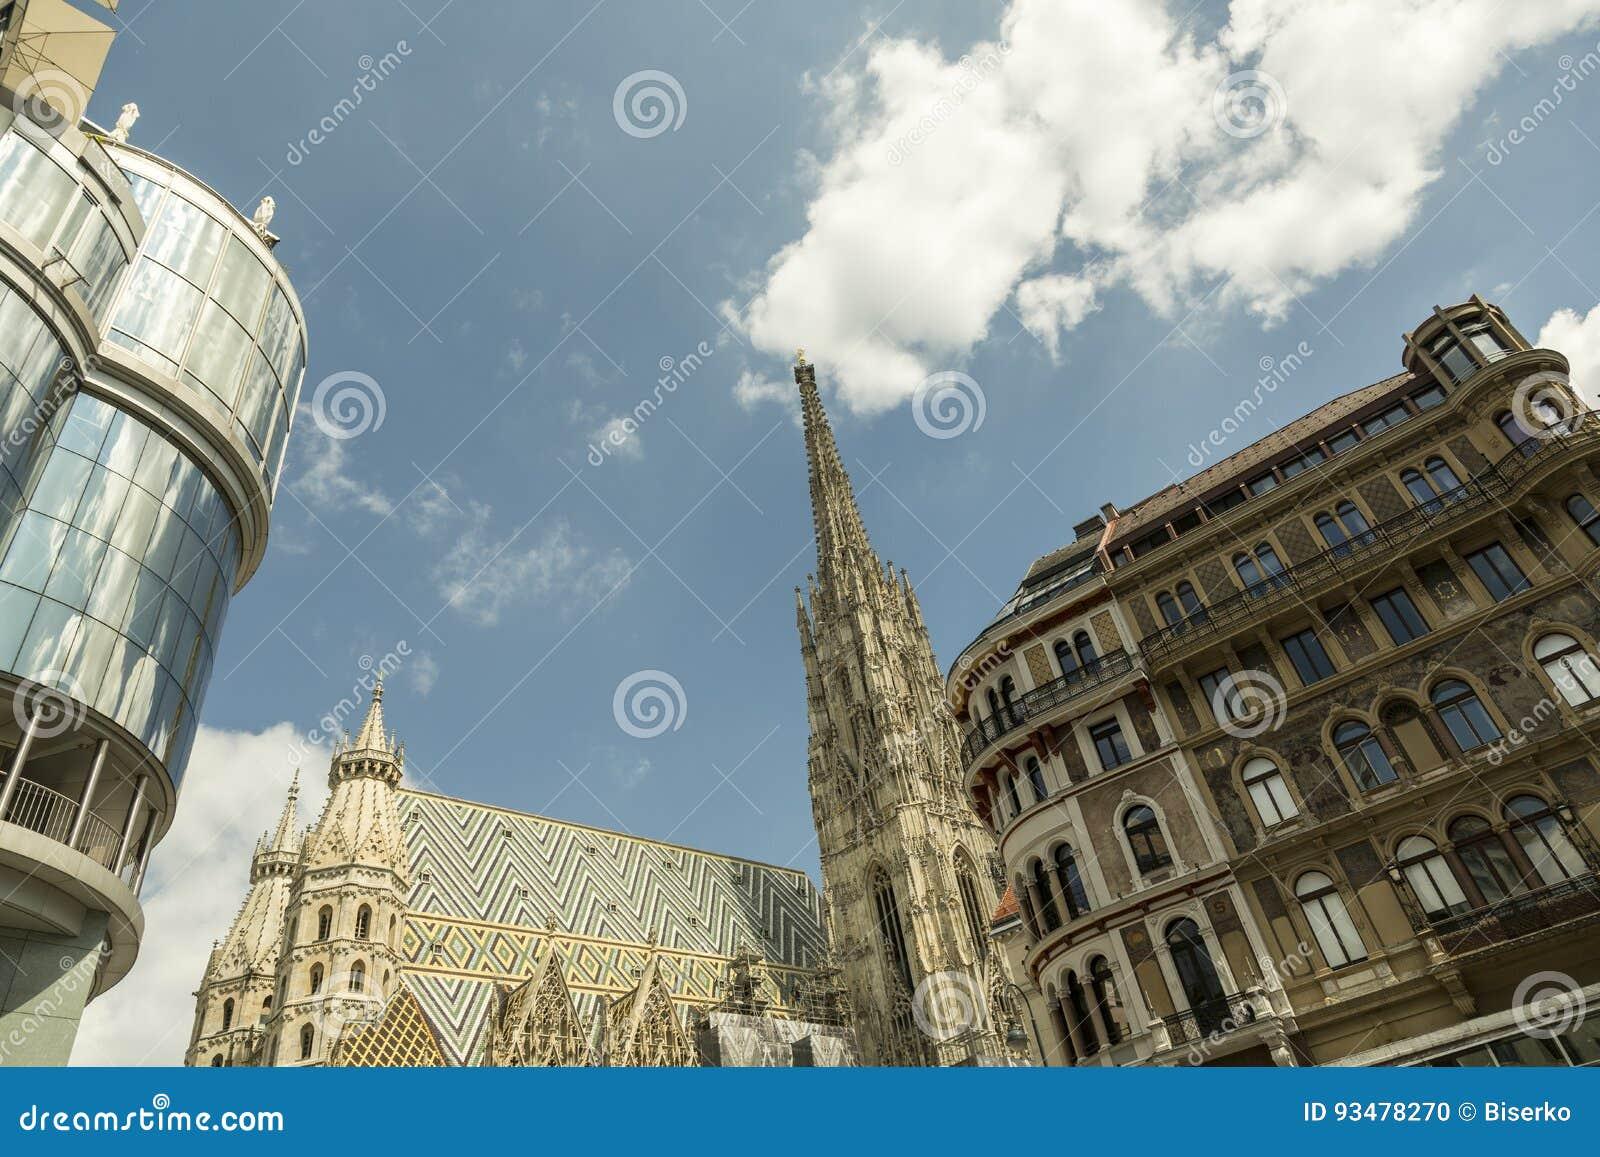 Three Architecture Styles In Vienna Austria Editorial Image